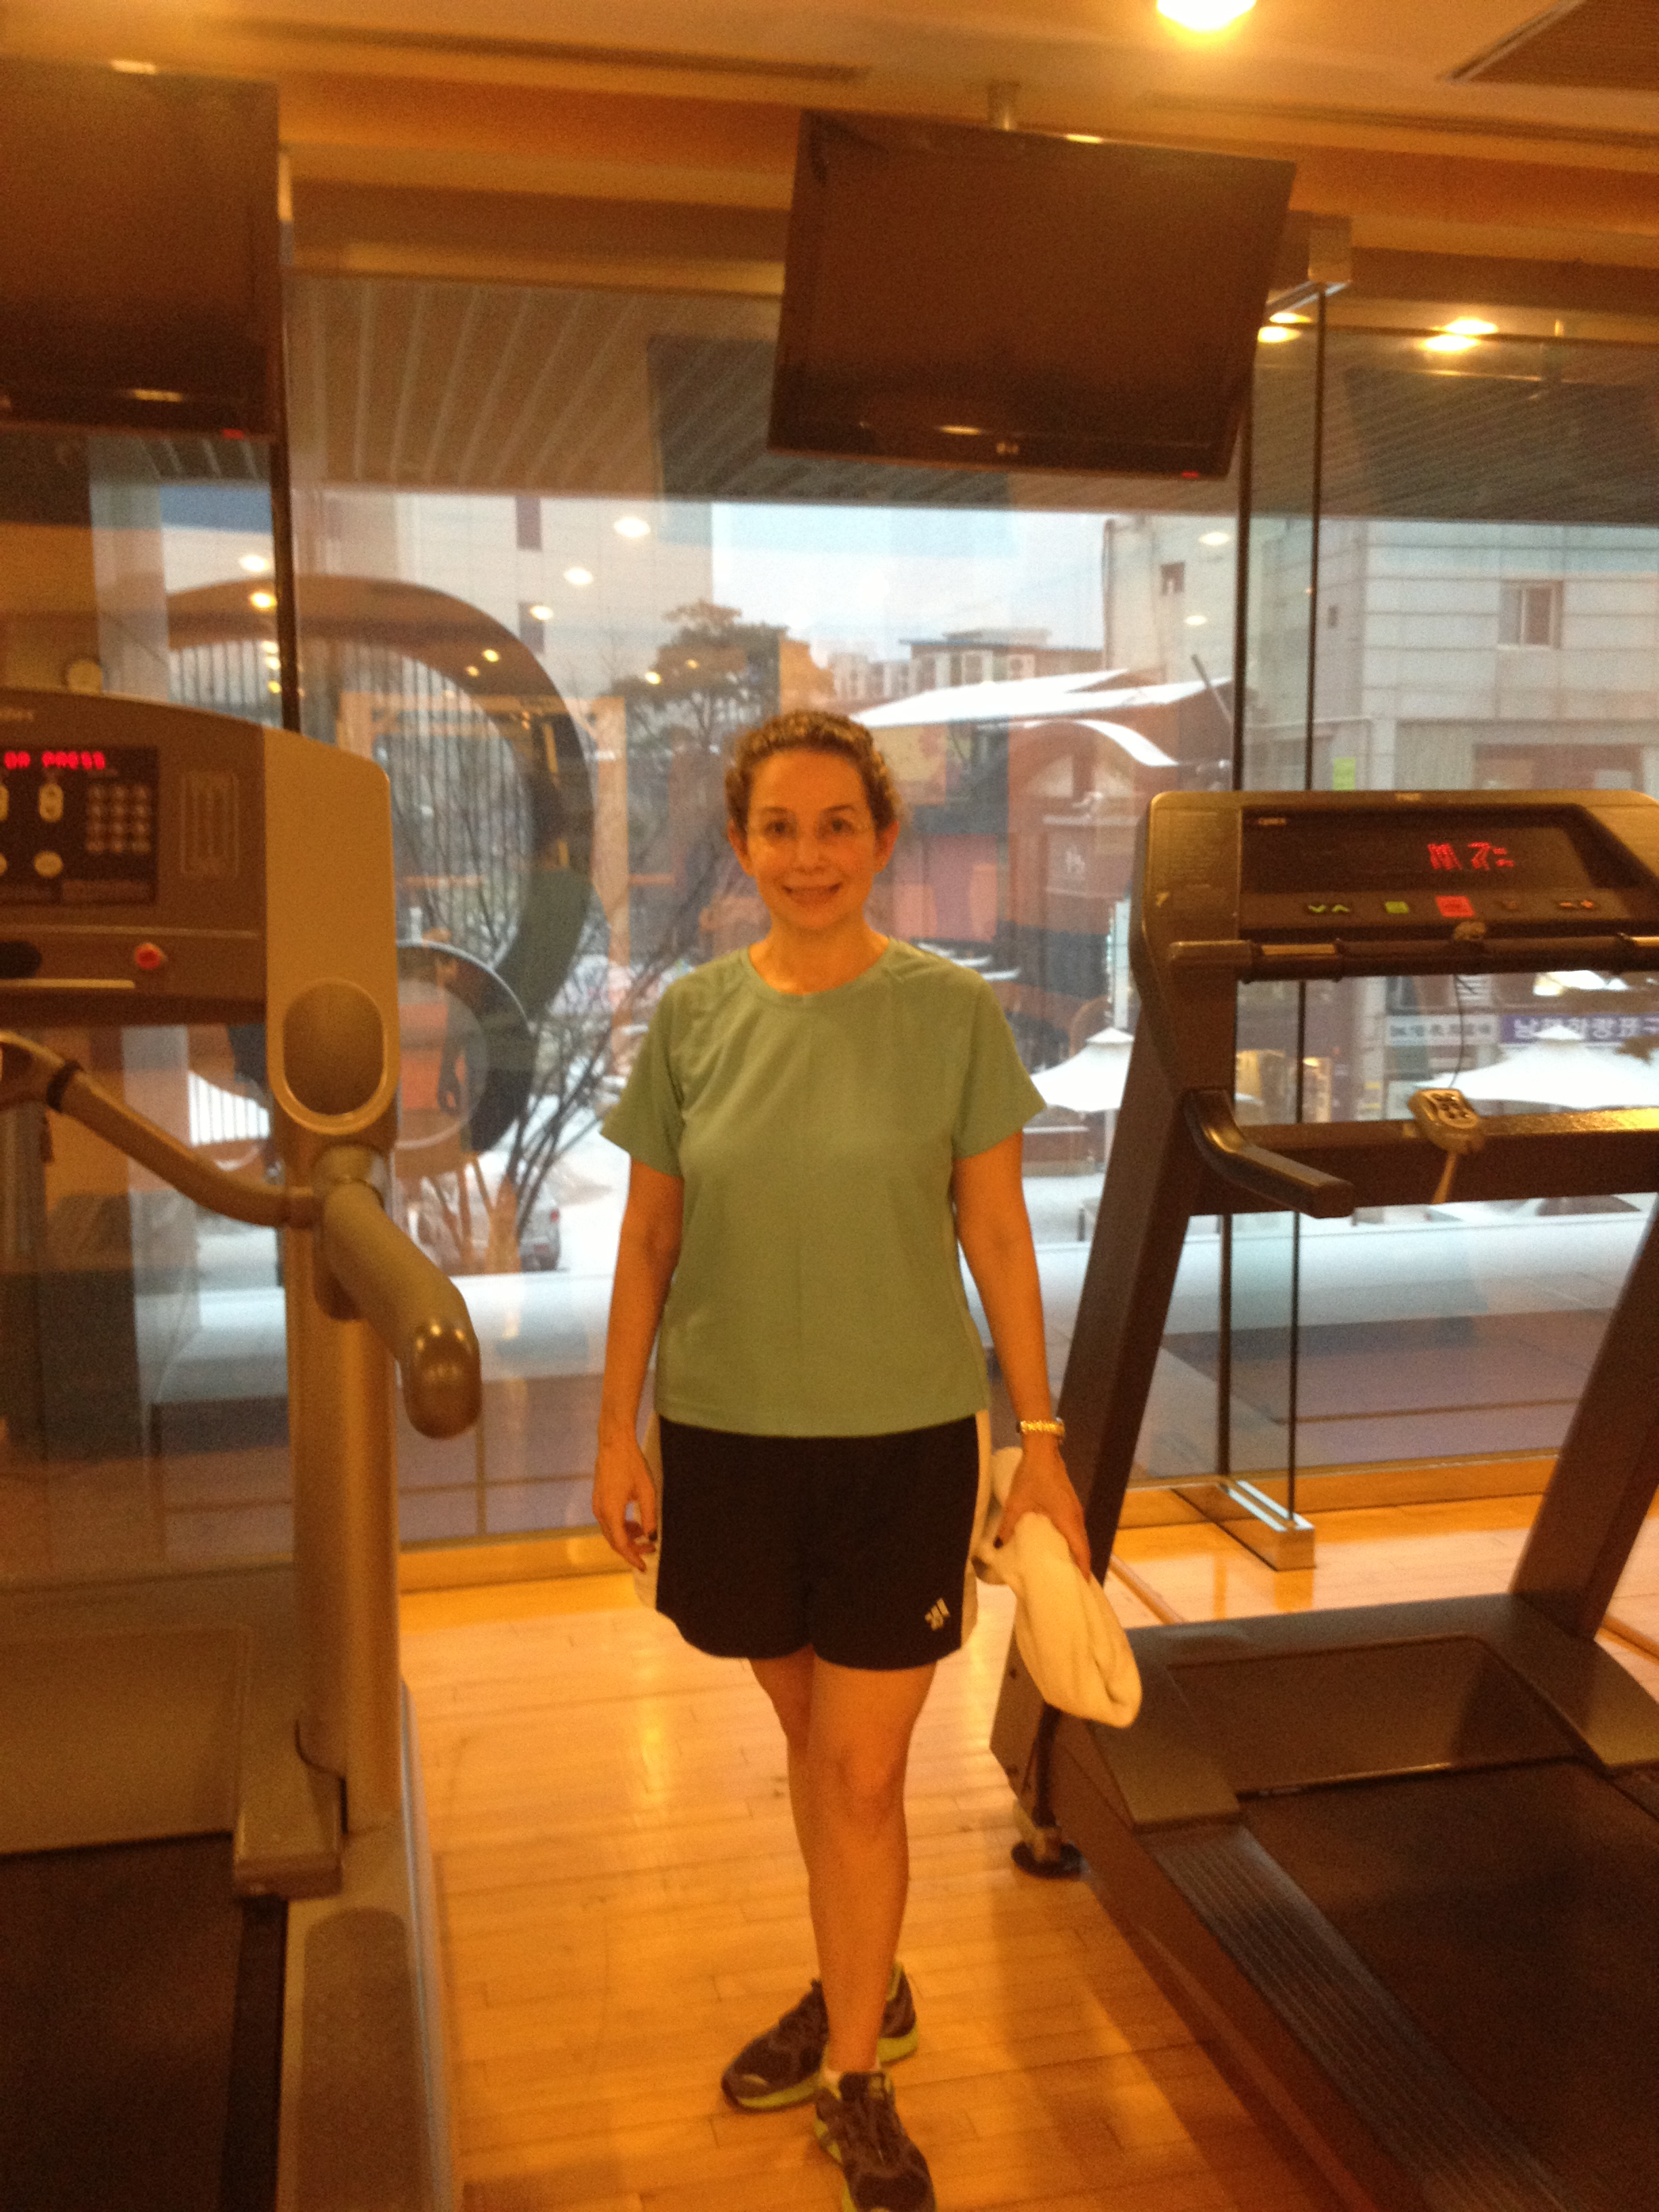 2nd floor gym